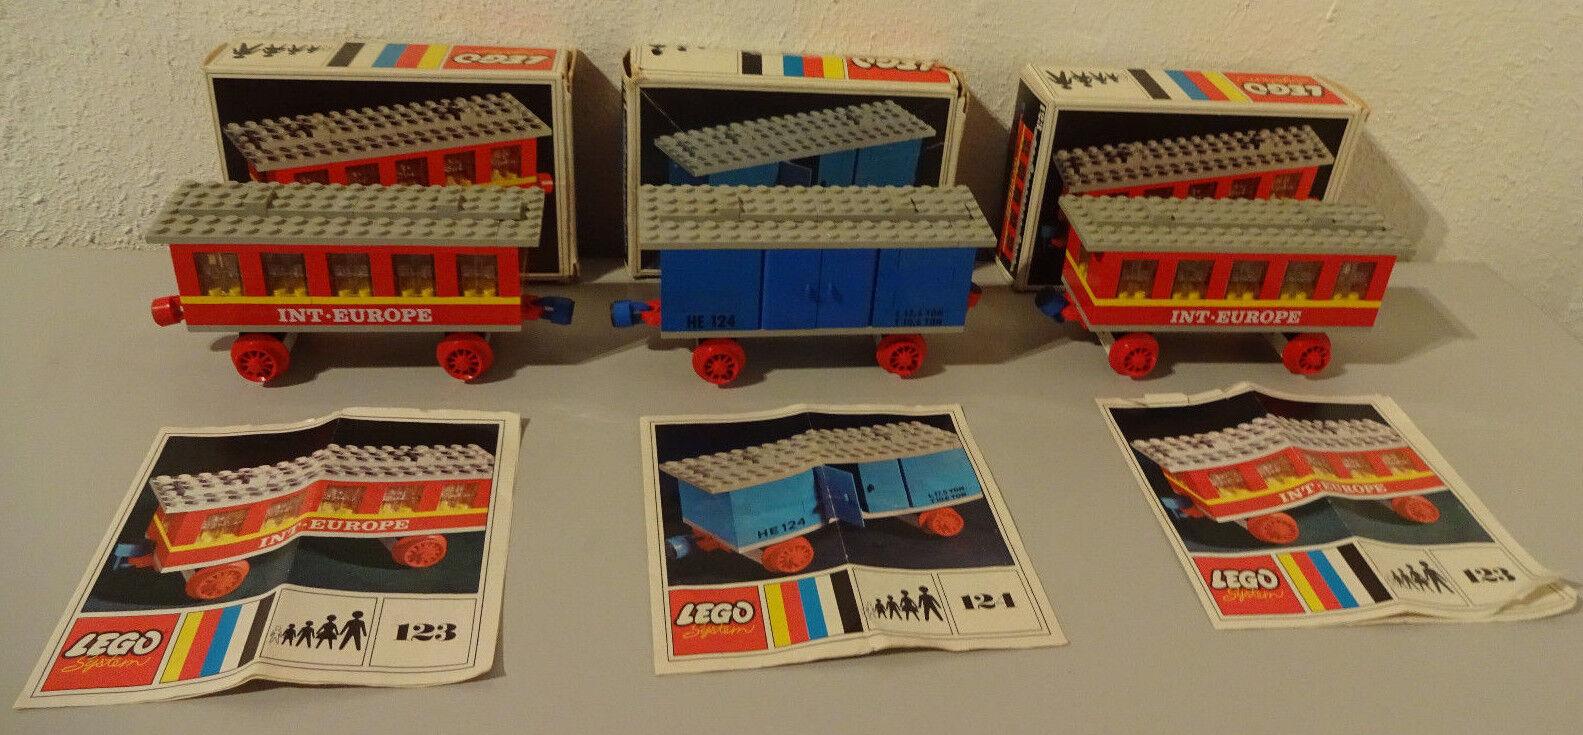 i7  LEGO Sistema 123 int-europe 124 MERCI Veicolo con scatola originale & BA